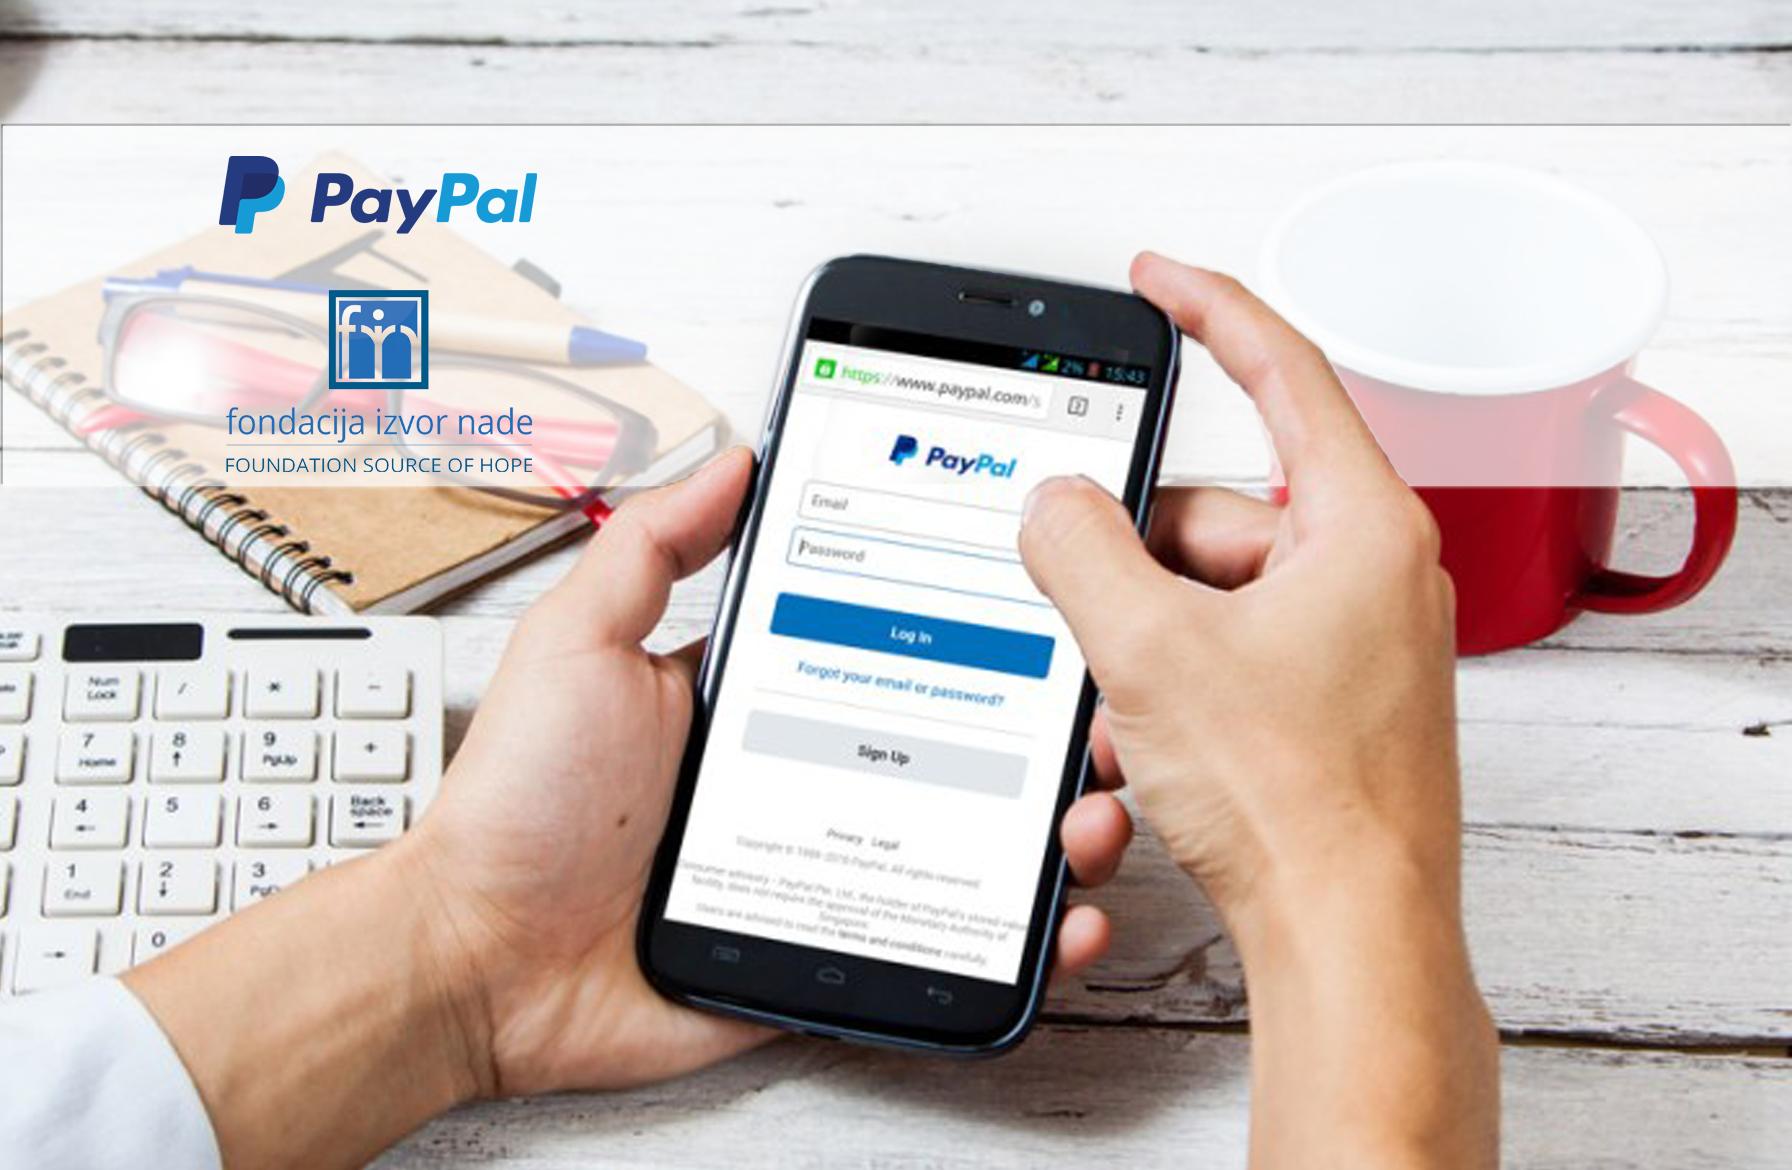 PayPal Fondacija Izvor nade